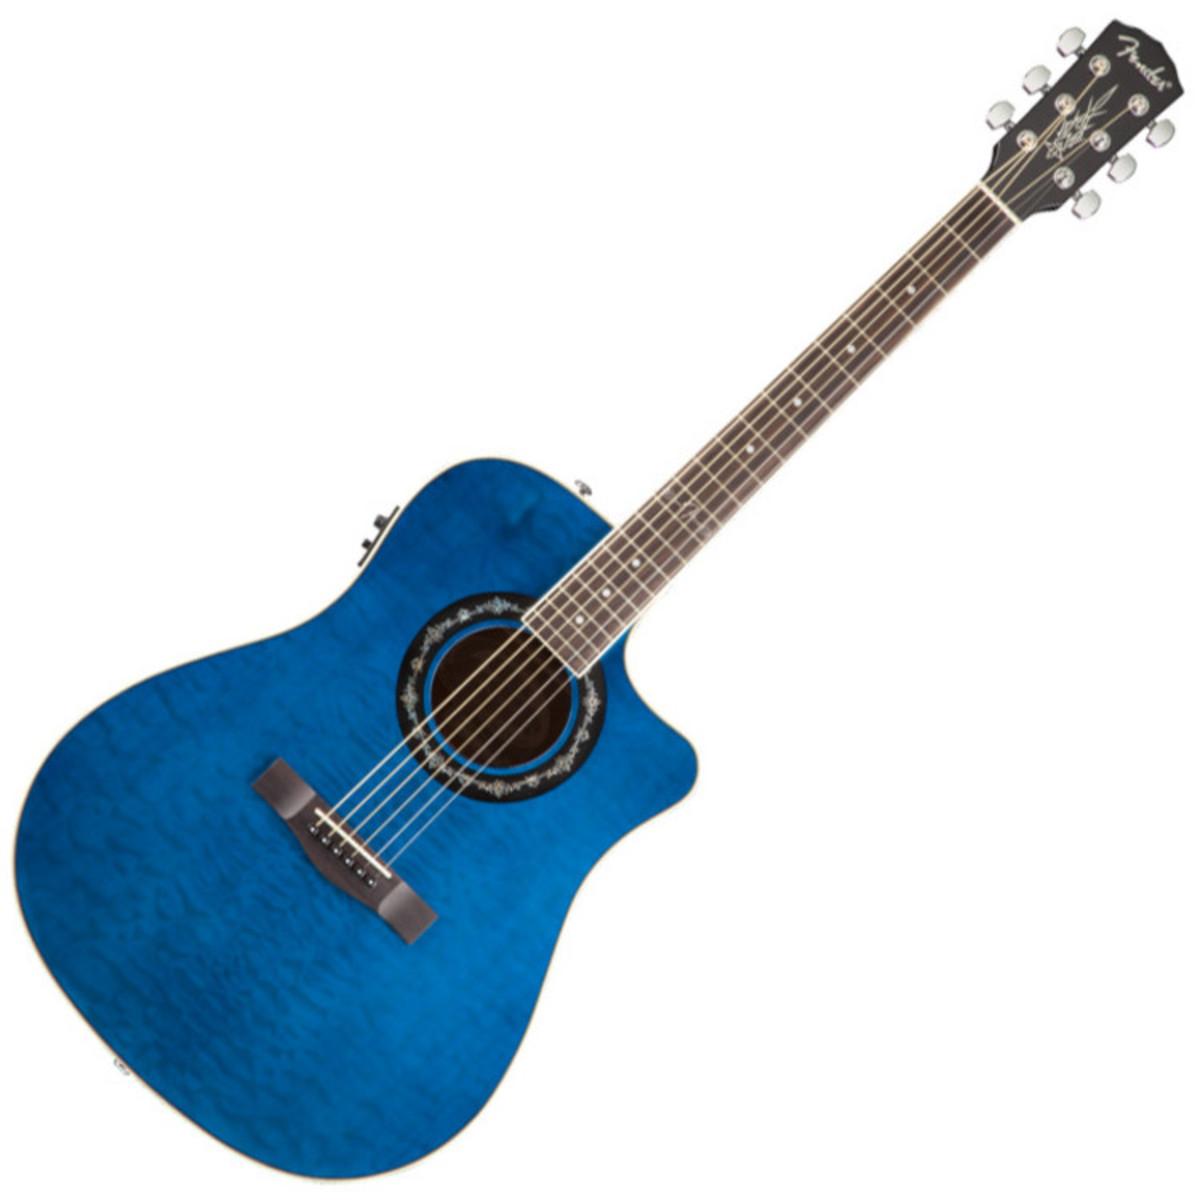 fender t bucket 300 ce electro acoustic guitar trans blue at. Black Bedroom Furniture Sets. Home Design Ideas